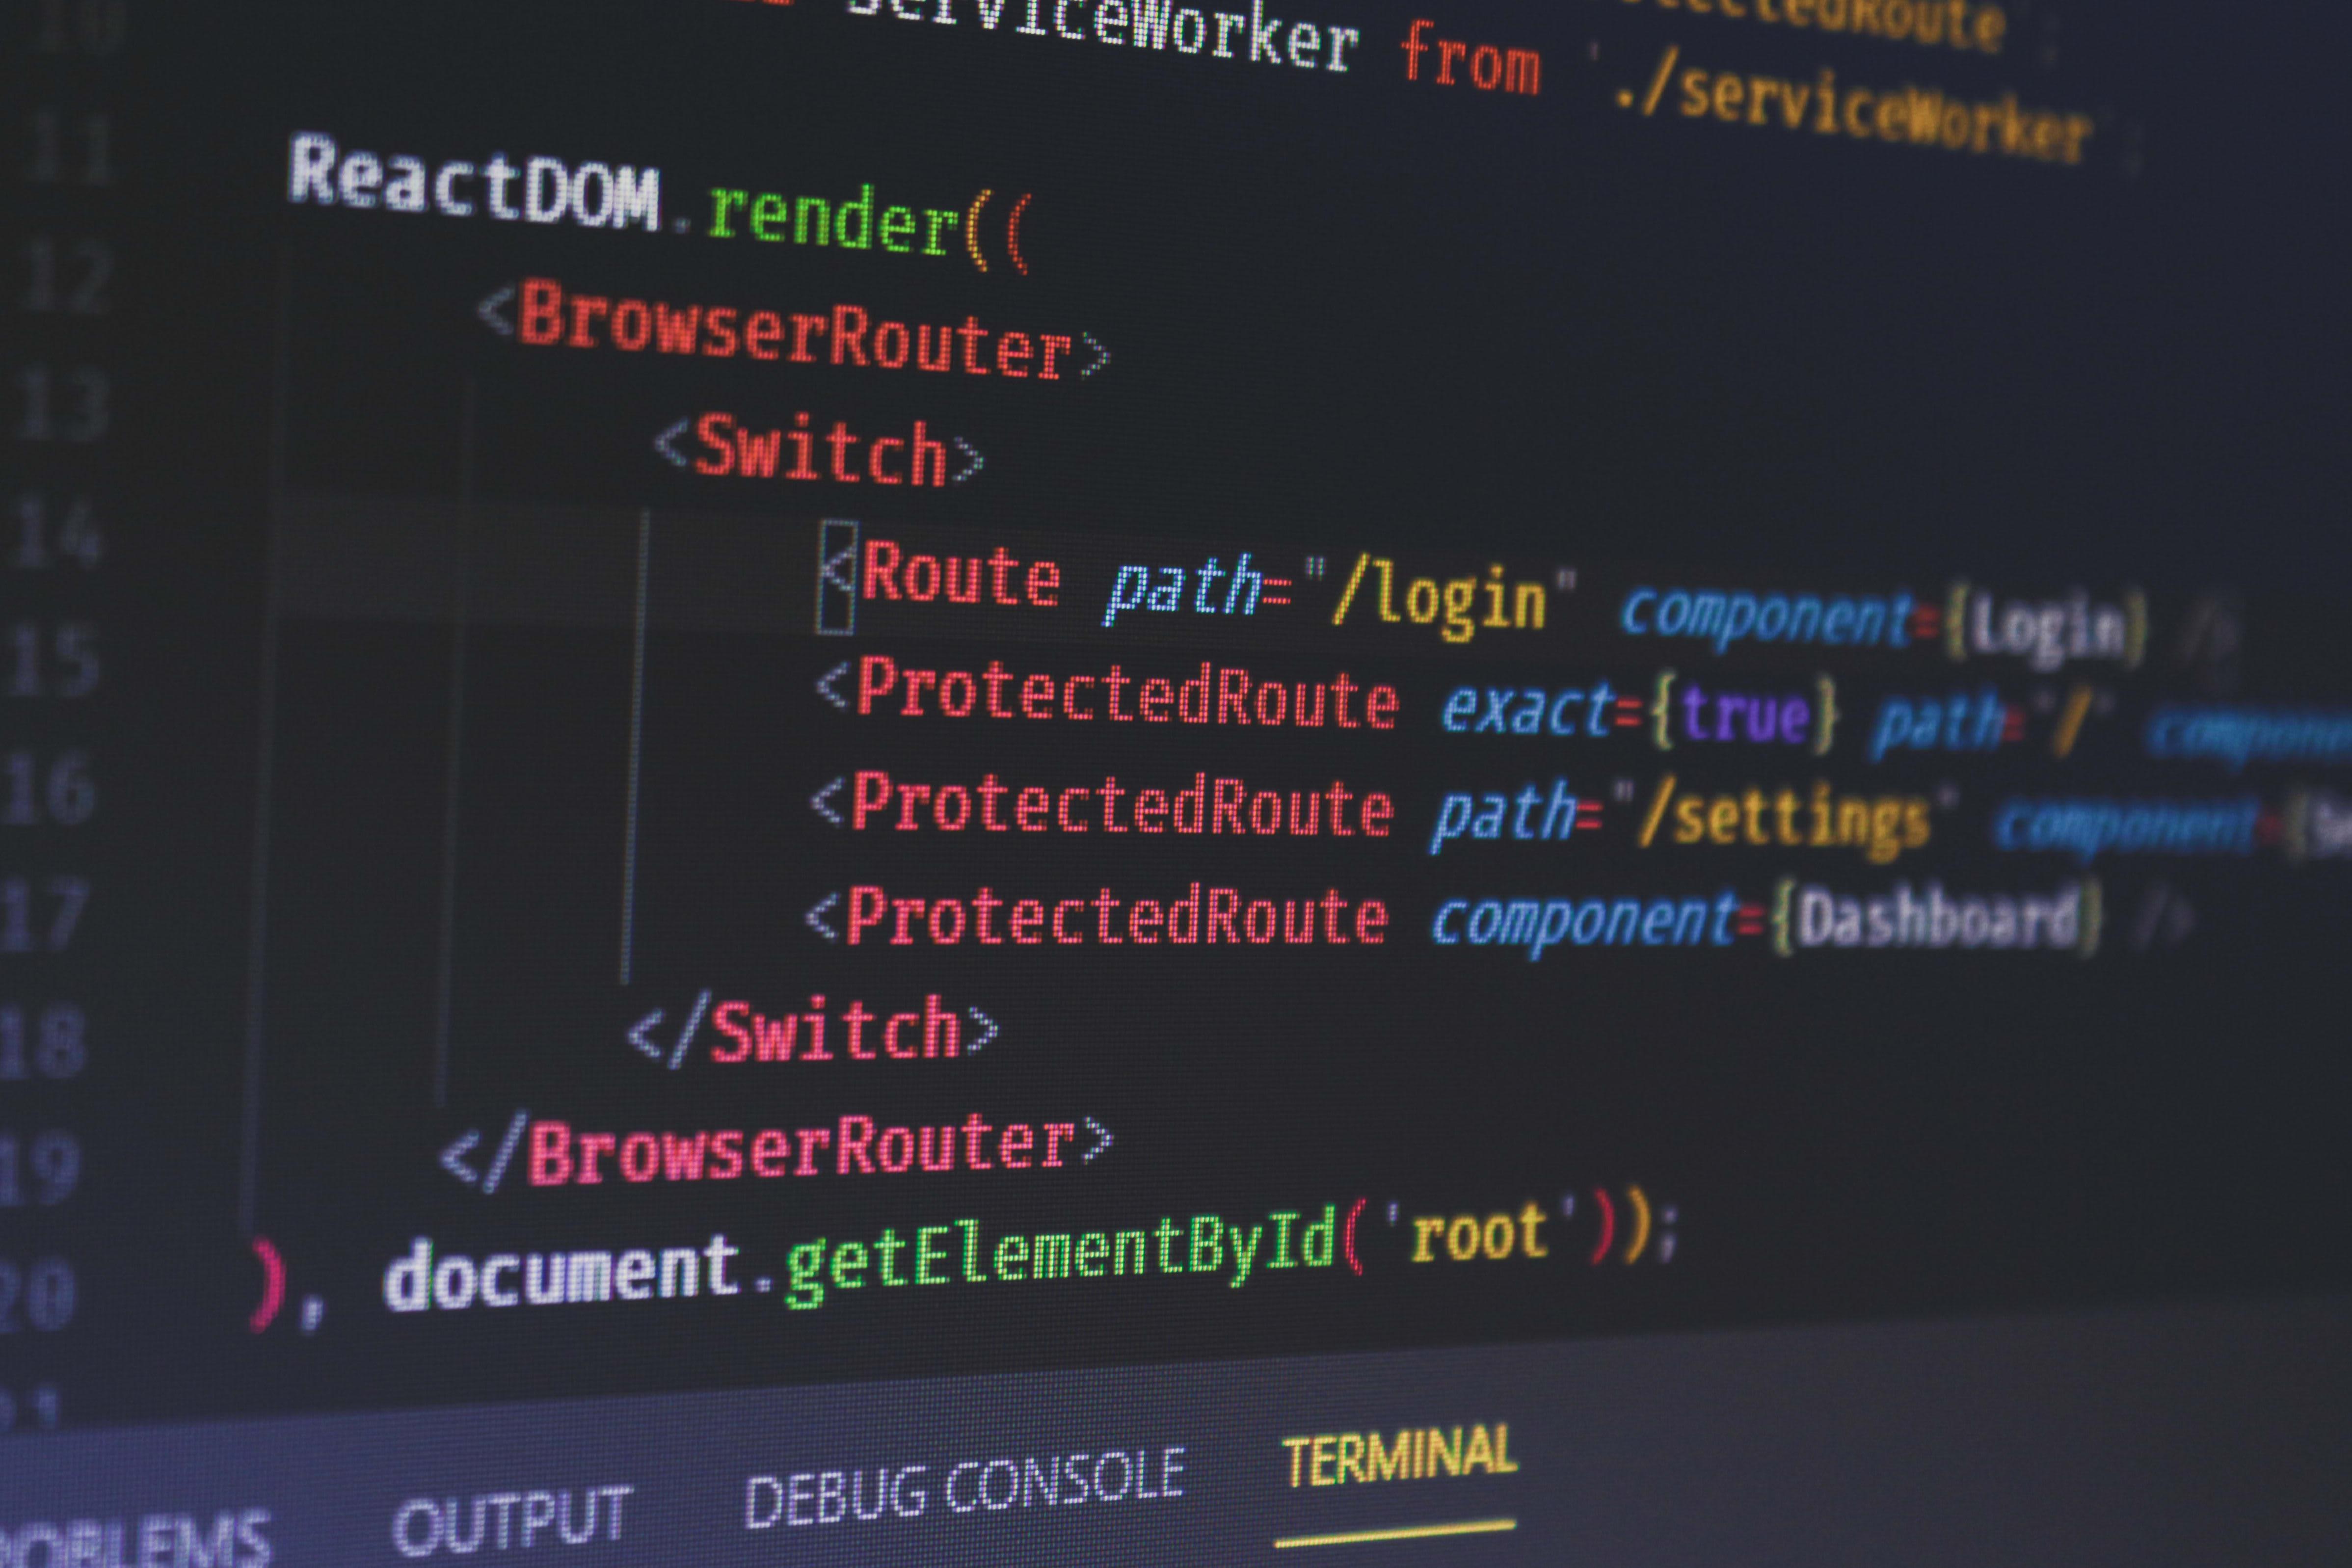 Portfolio for Java, Javascript, Nodejs, Maximo